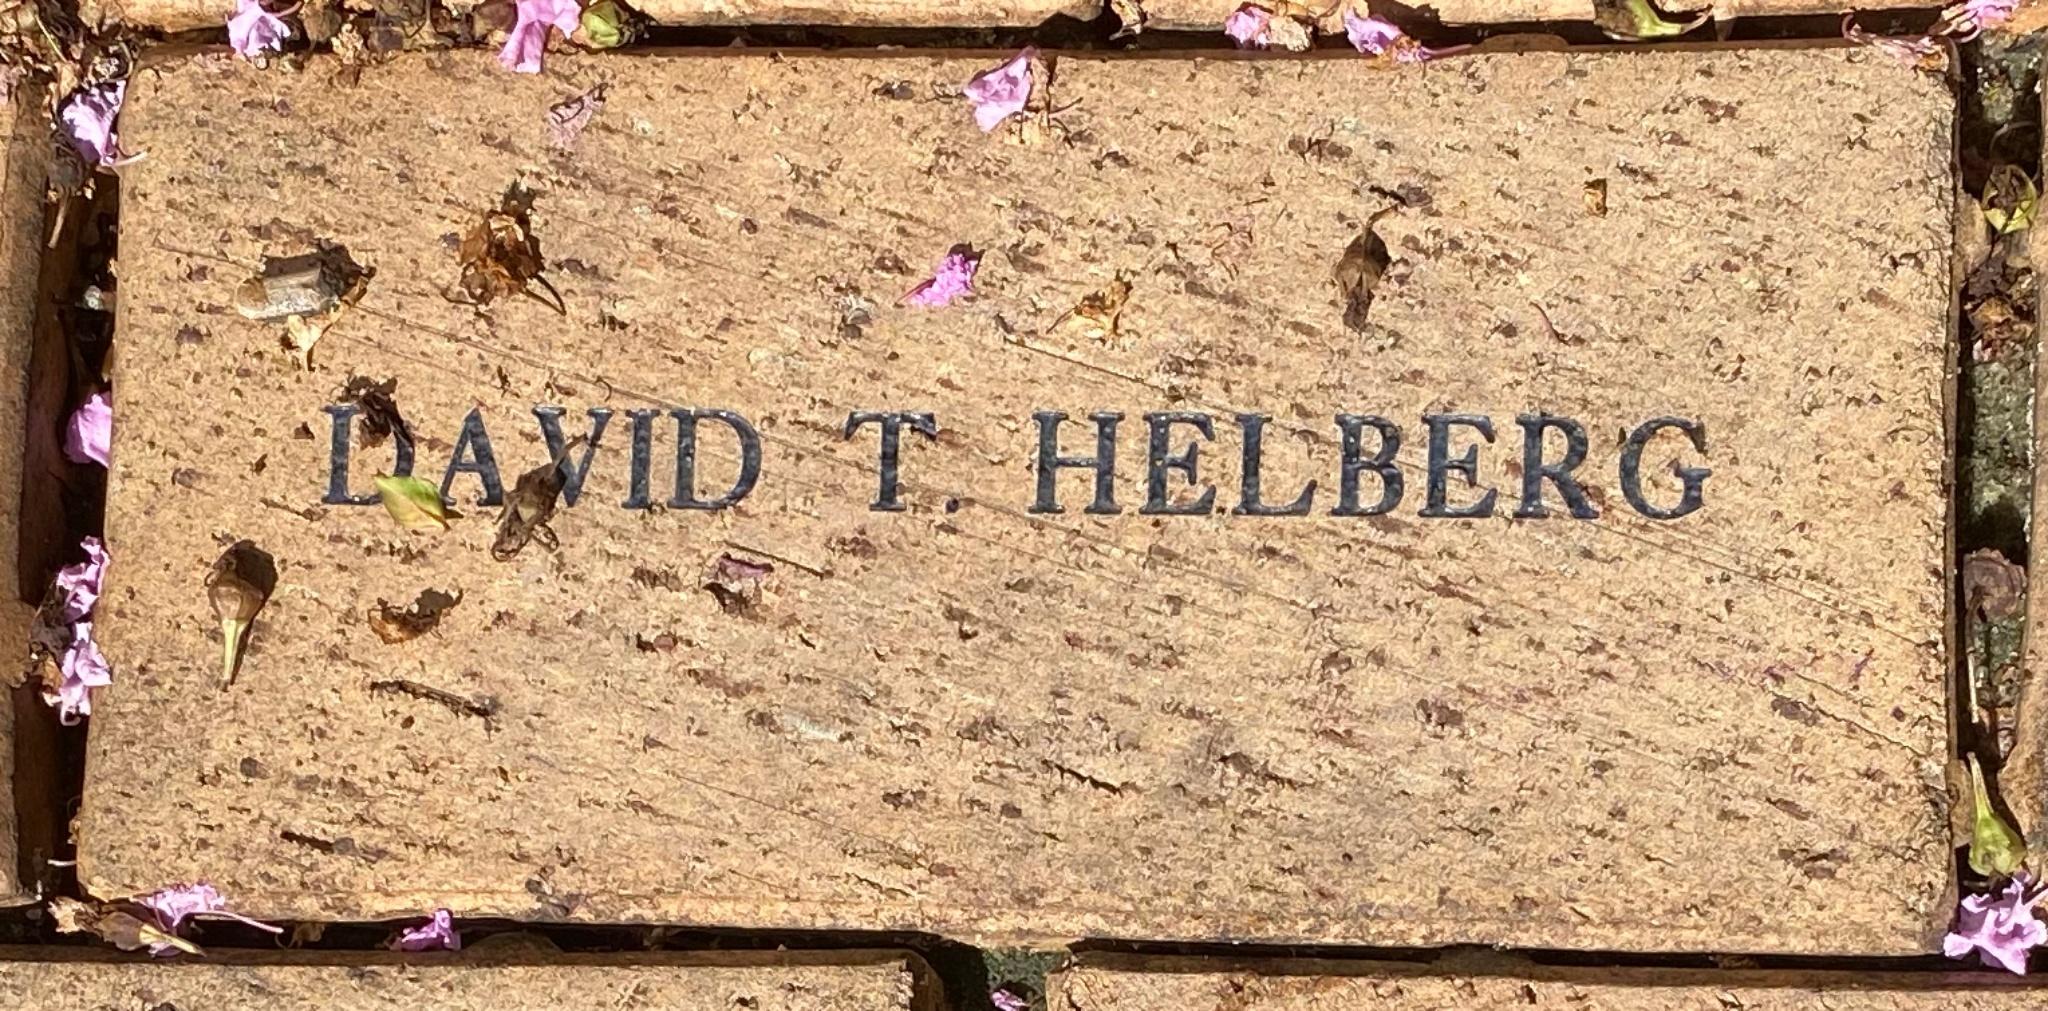 DAVID T. HELBERG